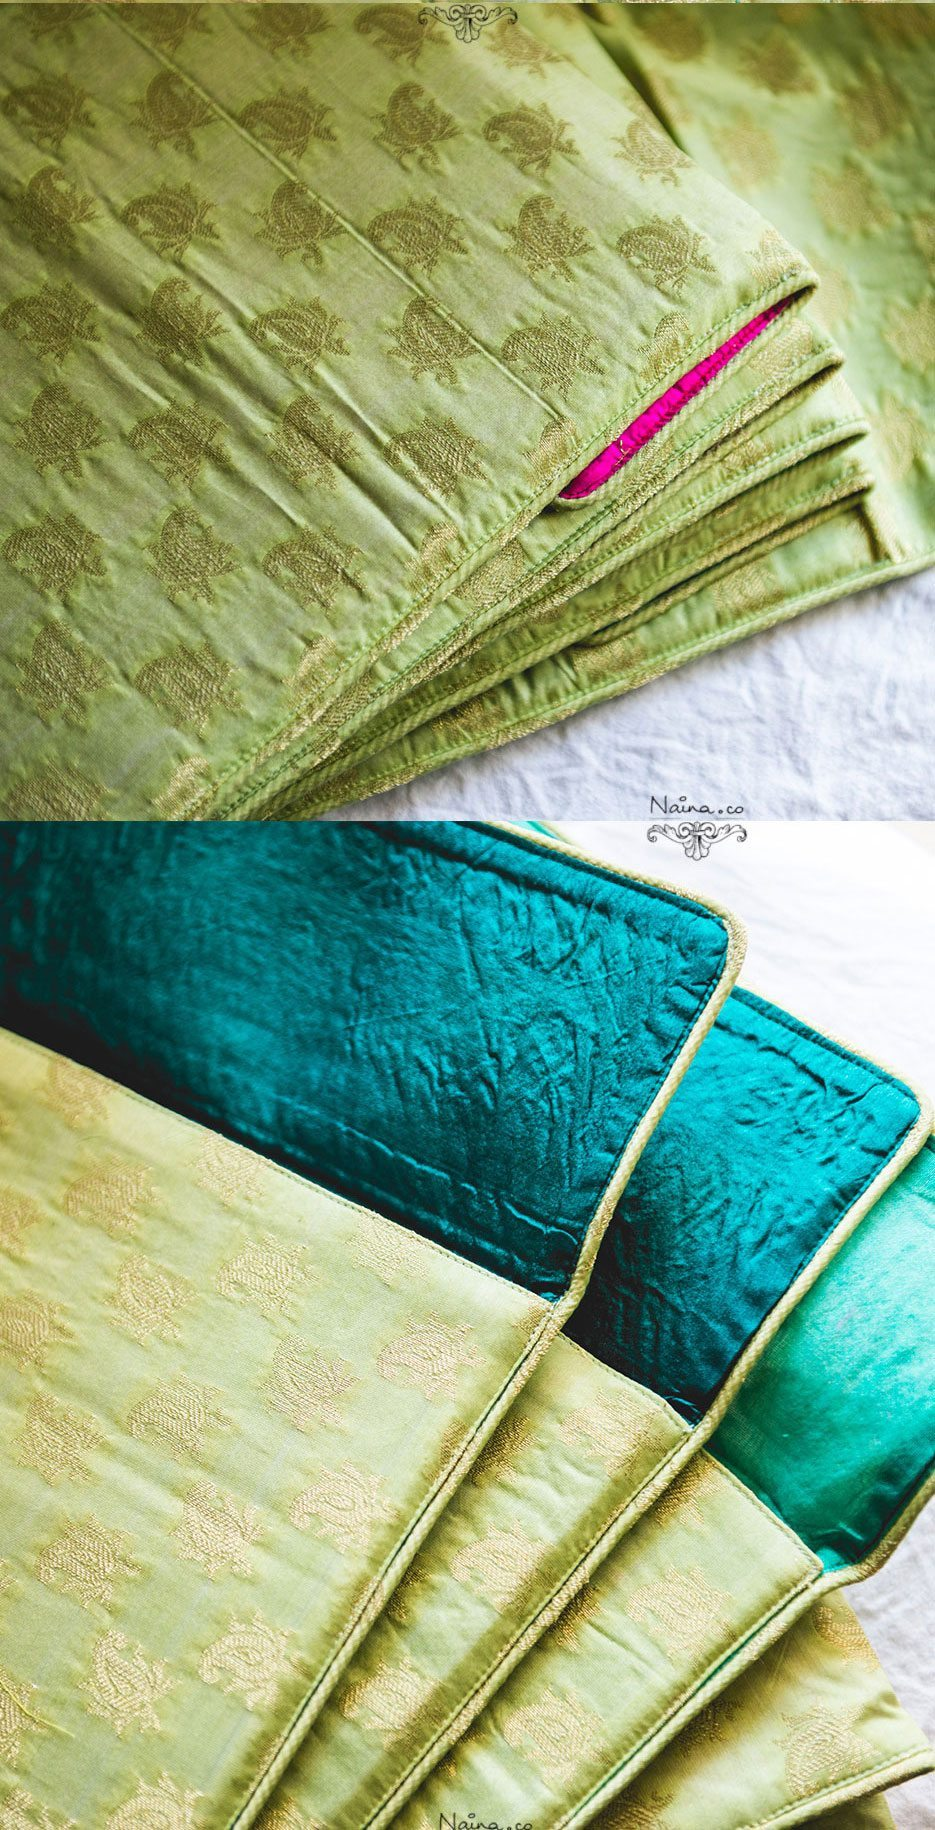 Cirare-Silk-Brocade-Book-Covers-PhotoBooks-Michelin-Star-Chefs-Lifestyle-Photographer-Blogger-Naina.co-Photography